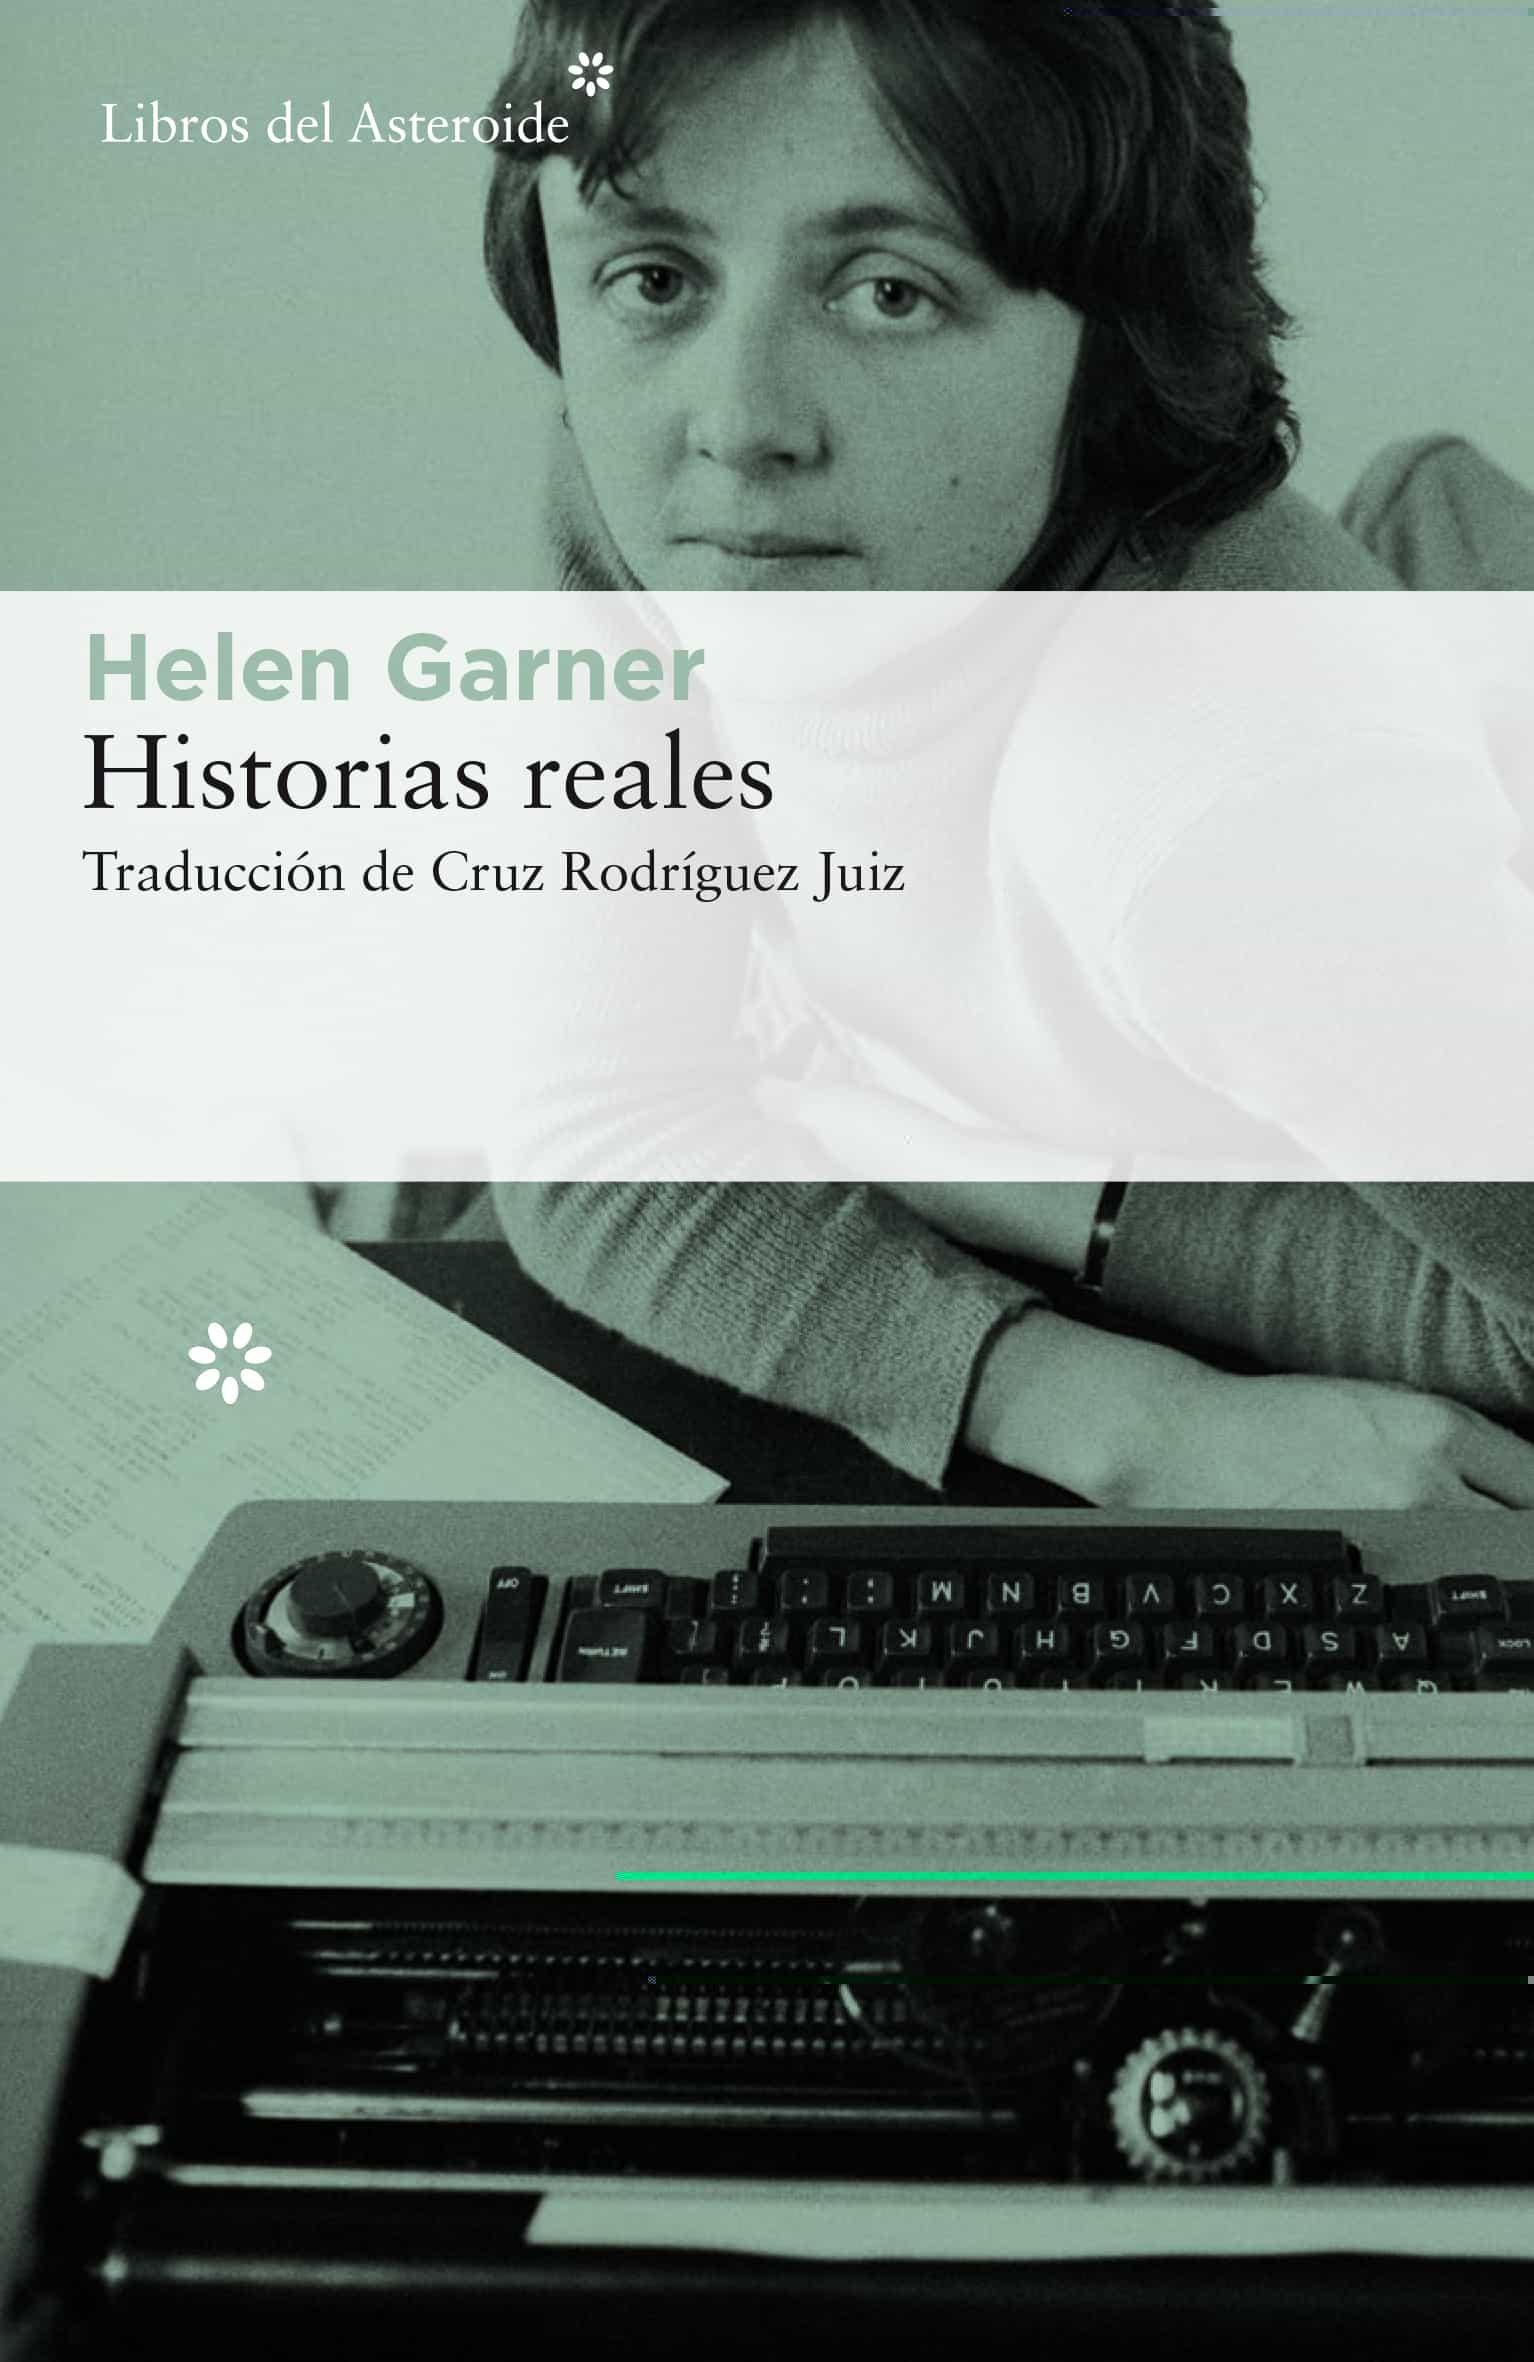 Historias reales, de Helen Garner